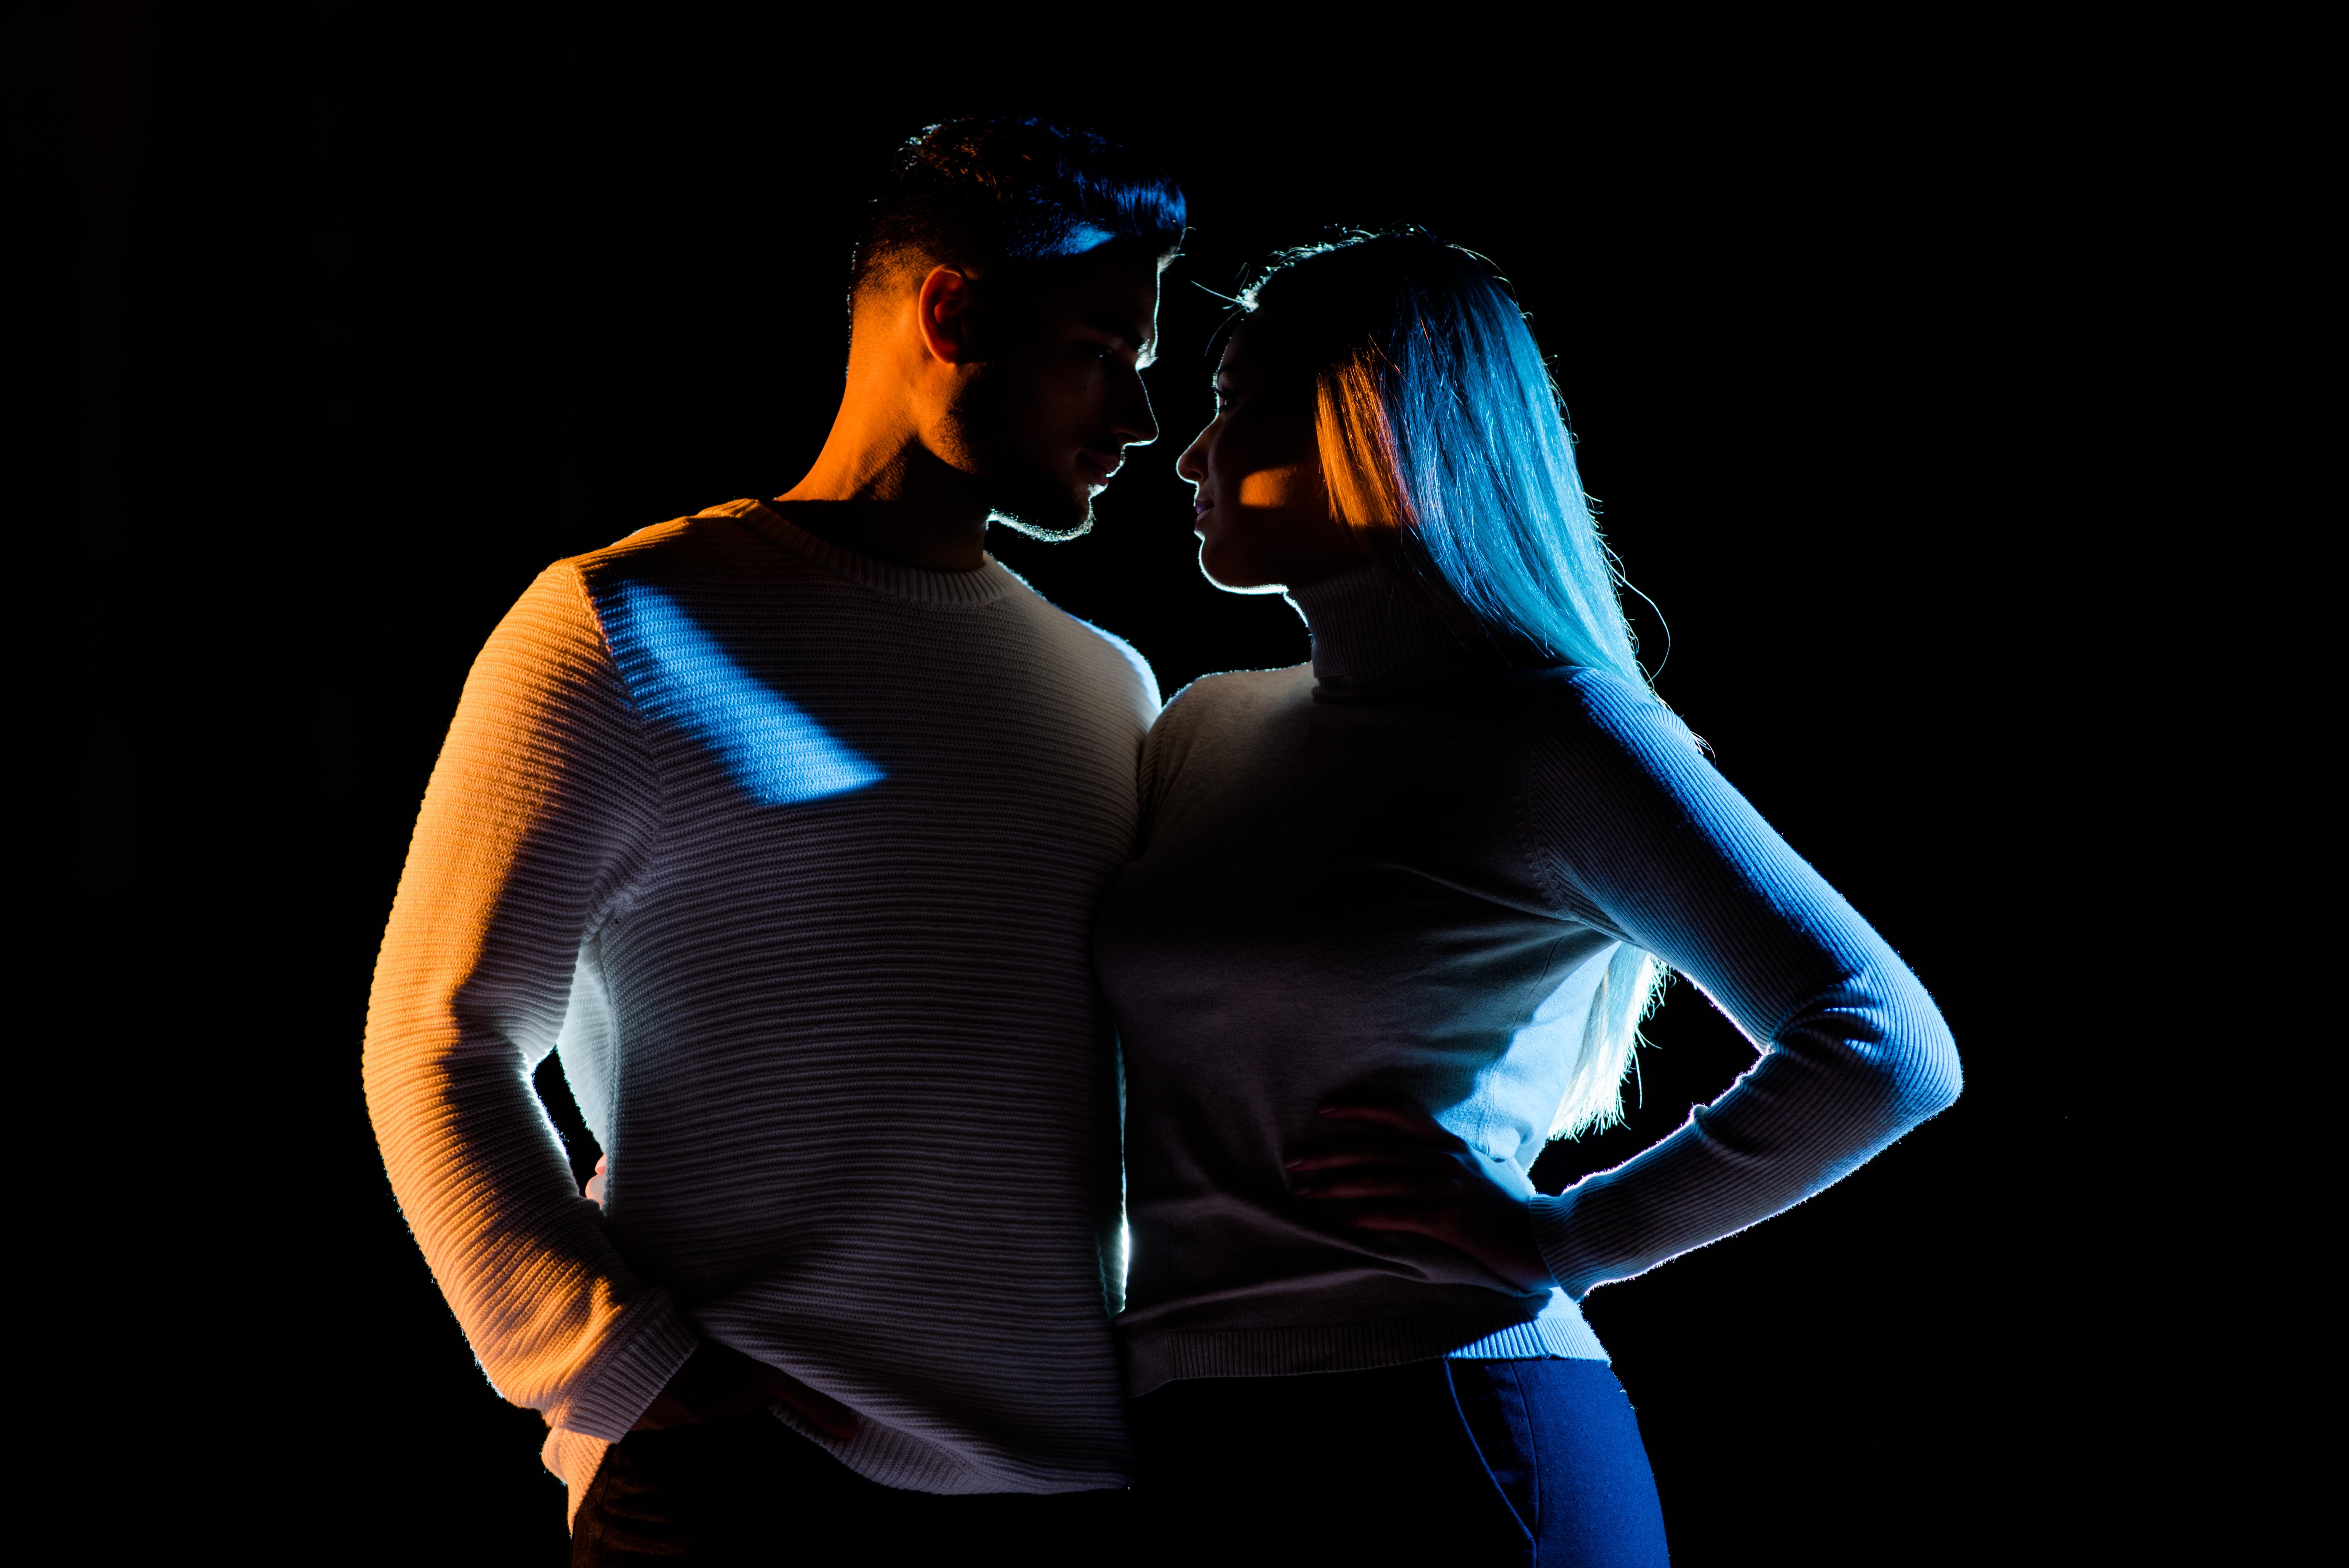 shooting_photo_couple